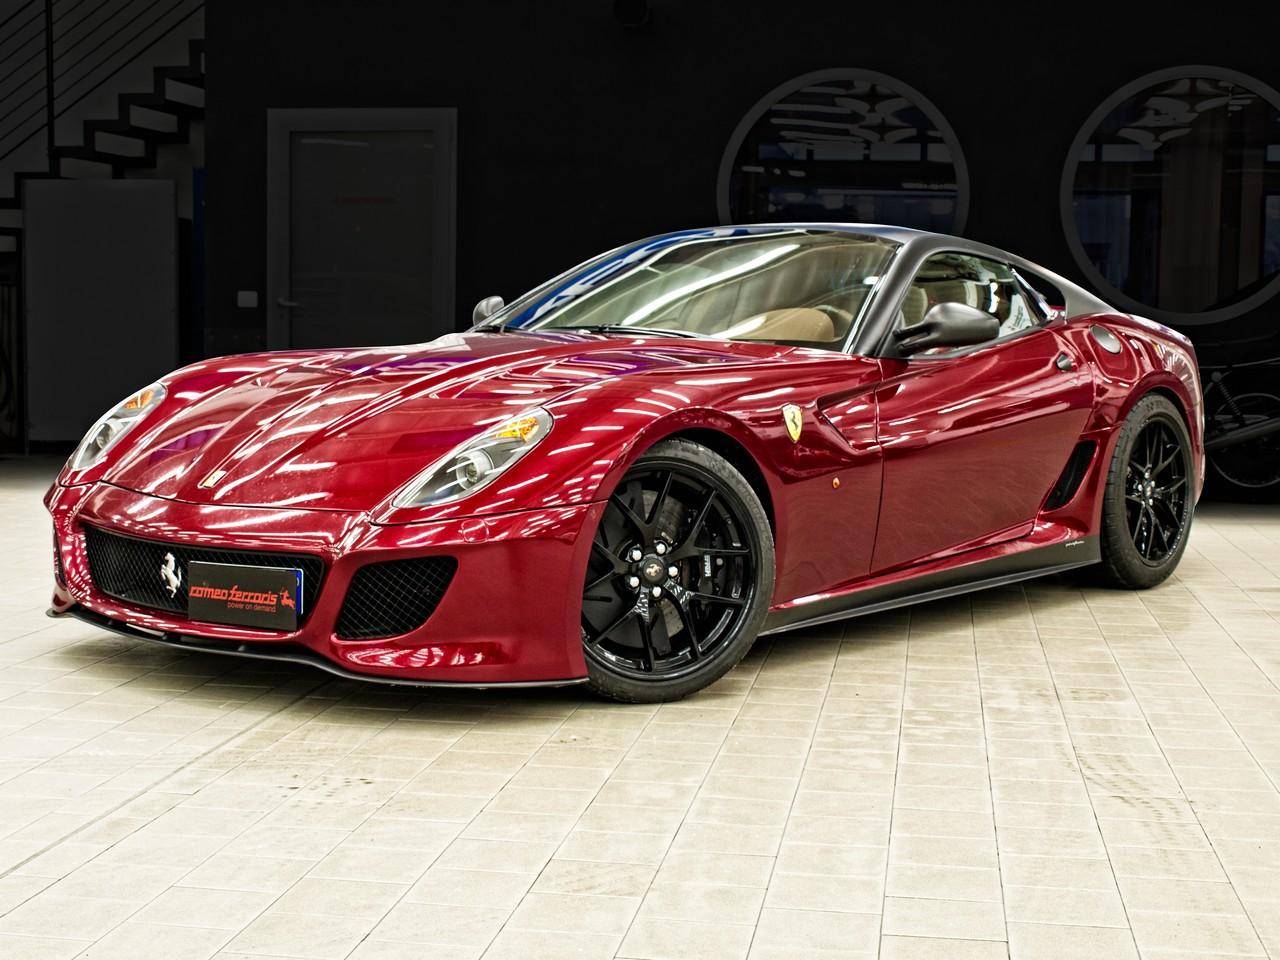 http://images.caradisiac.com/images/7/4/5/9/77459/S0-Ferrari-599-GTO-par-Romeo-Ferraris-pour-40-ch-de-plus-258688.jpg